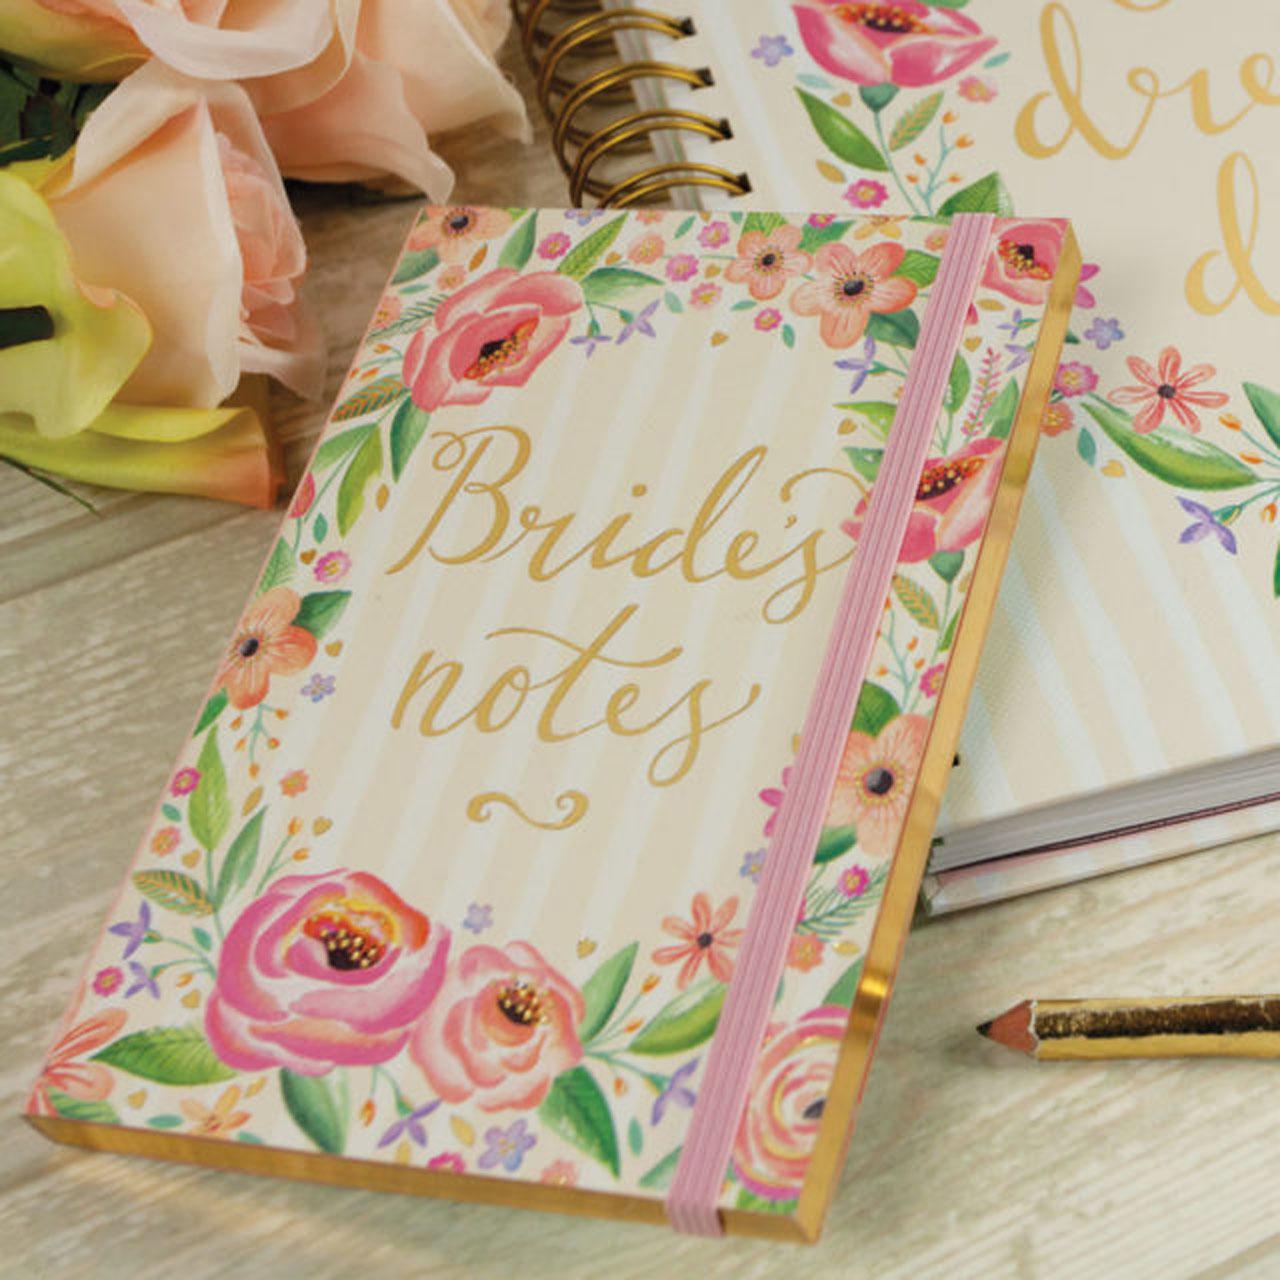 WDPNB2-brides-notebook-floral-lifestyle-1-1-640x640